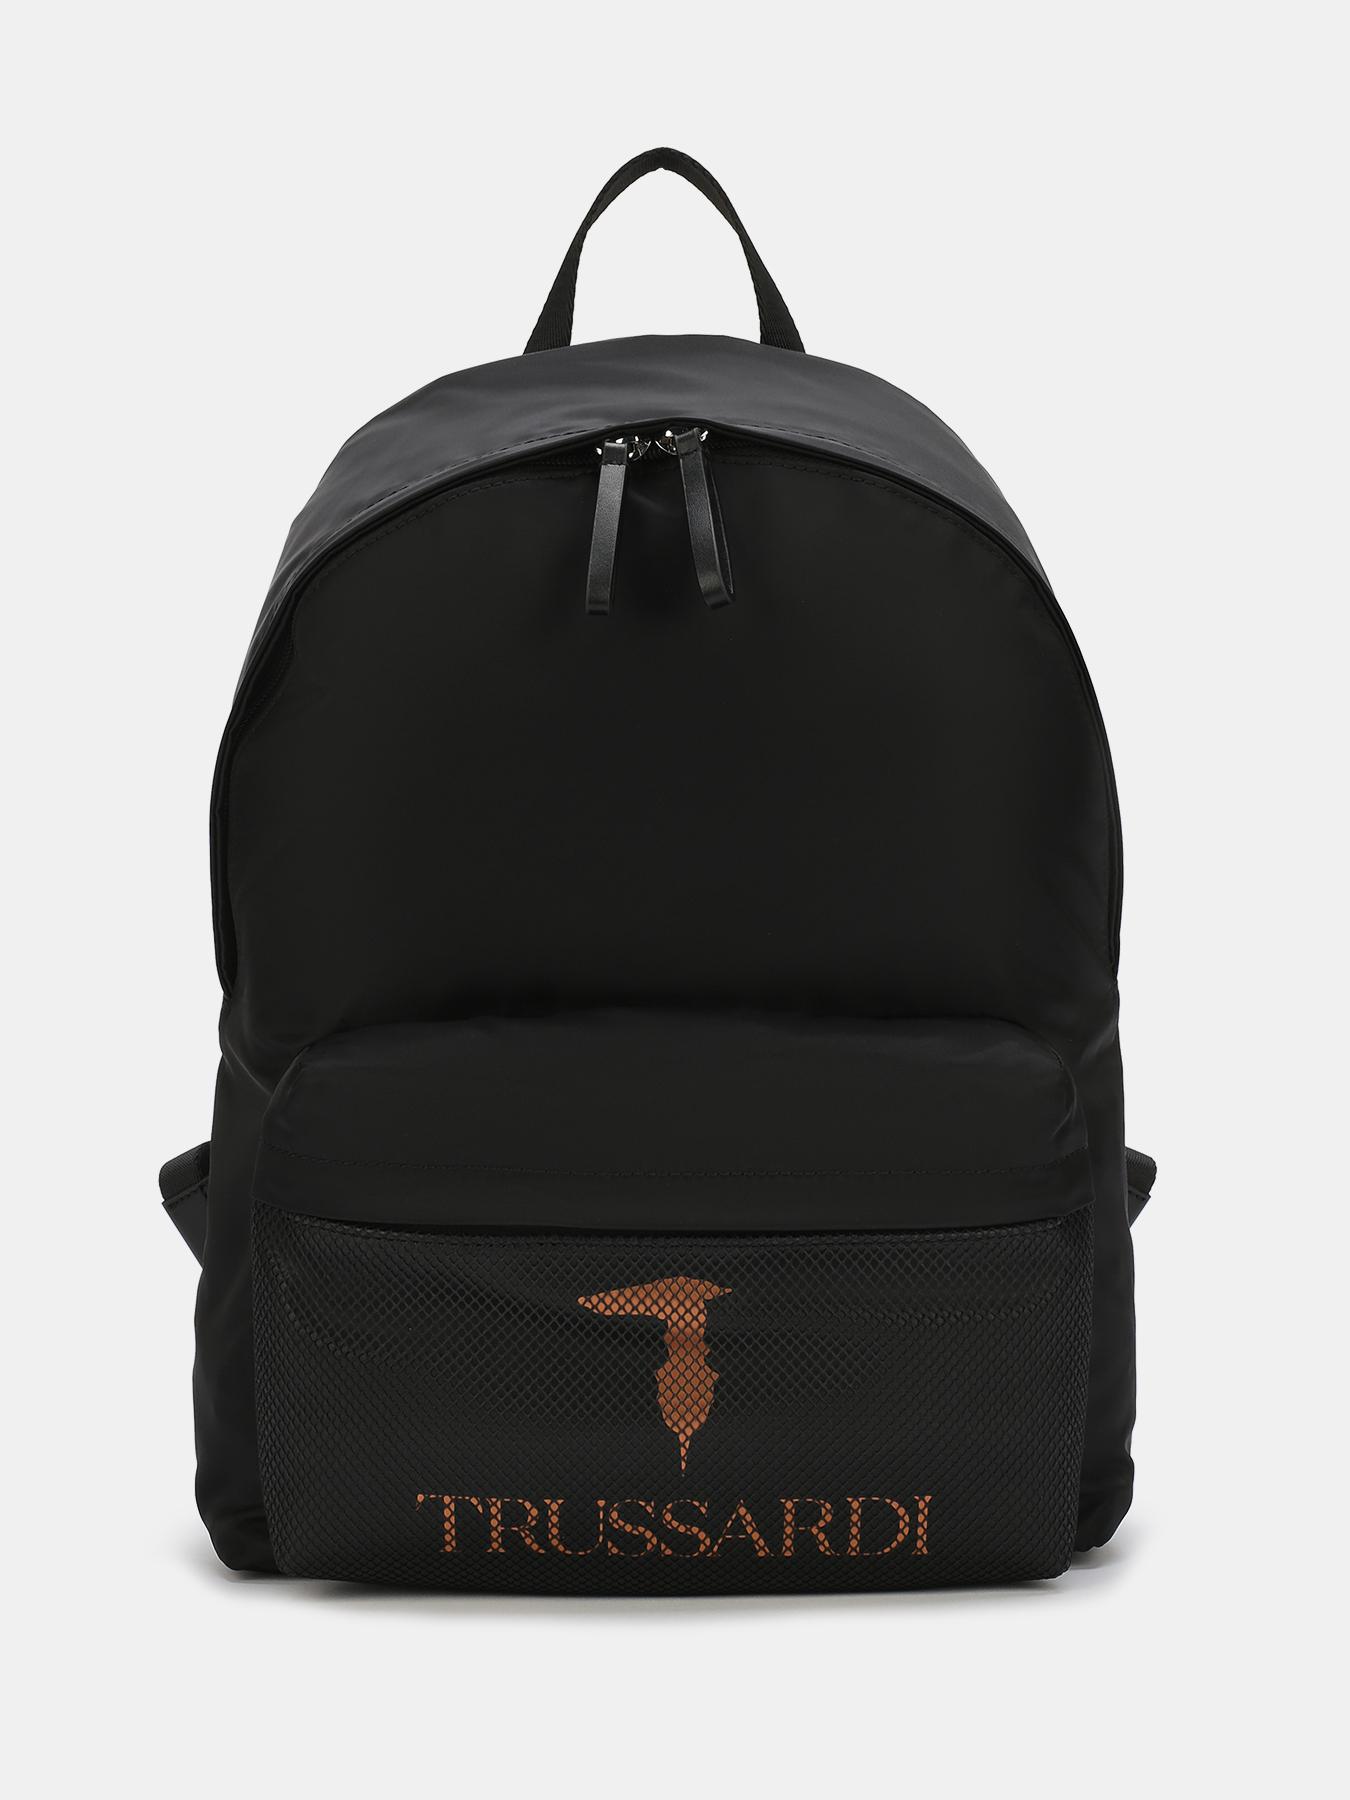 Рюкзаки Trussardi Jeans Рюкзак сумка trussardi jeans 75b00684 9y099999 k299